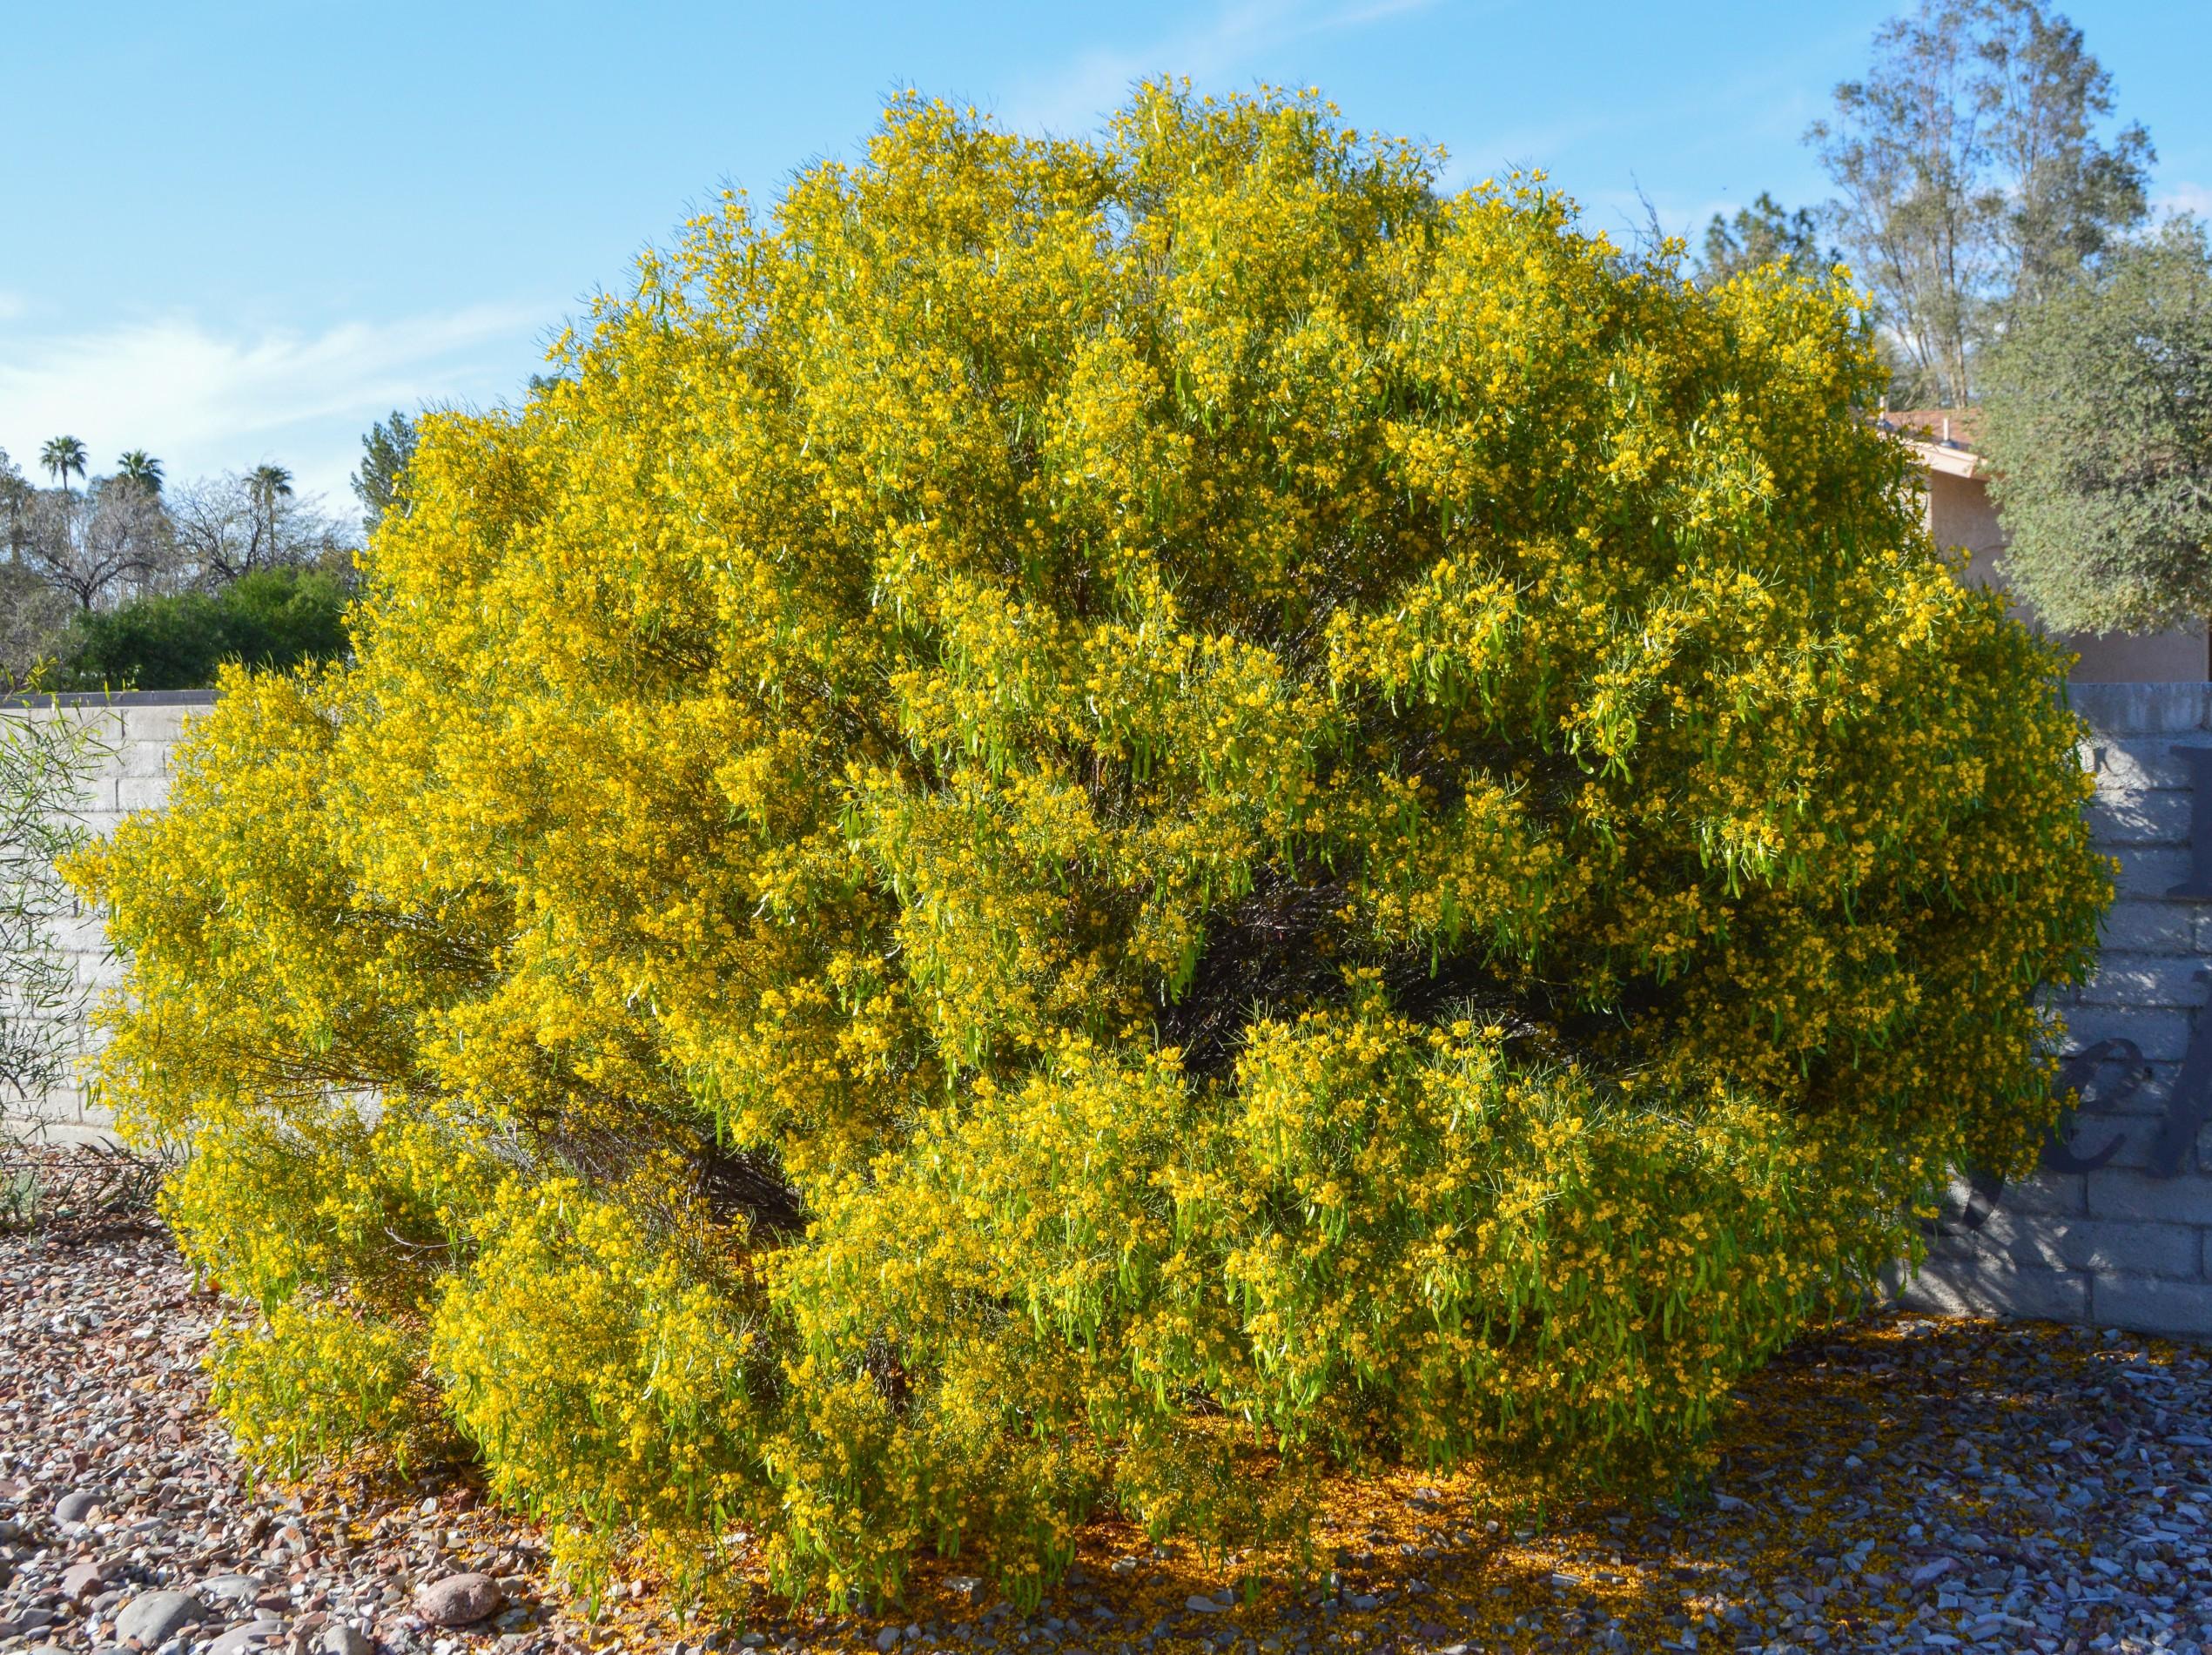 Senna nemophila (Cassia nemophila)